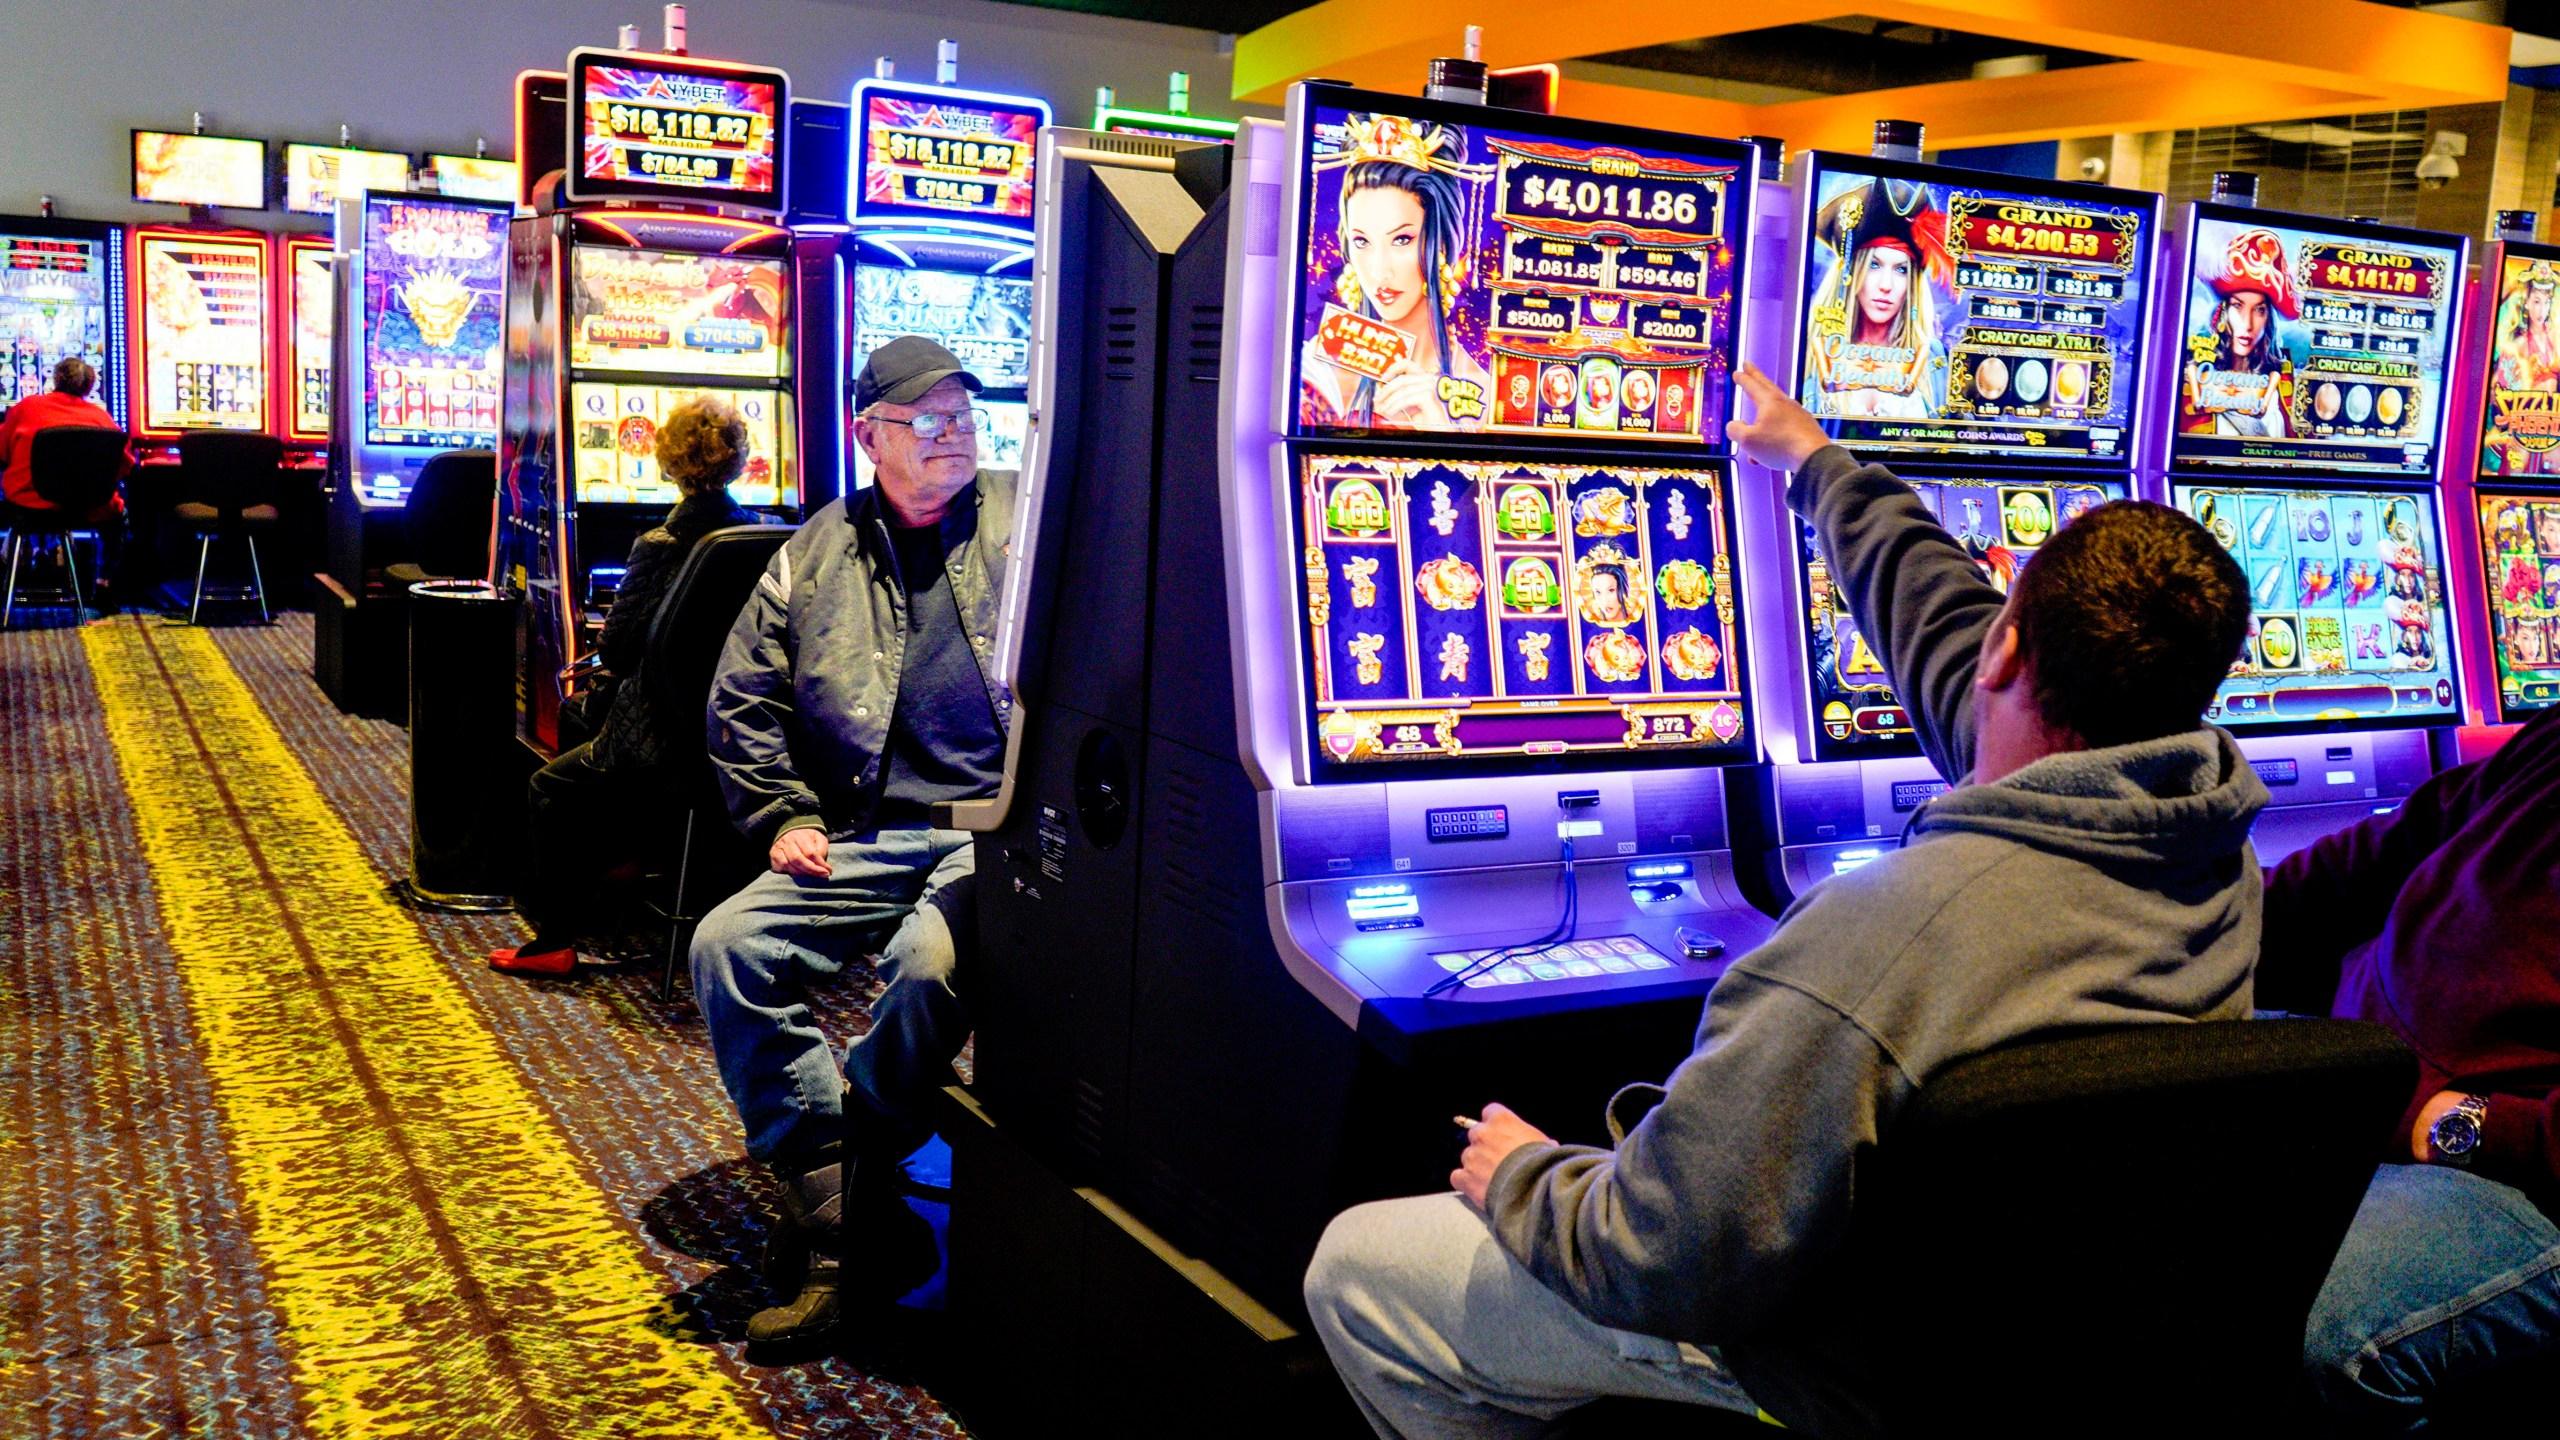 Tribal_Casino_Fight_32514-159532.jpg12041884